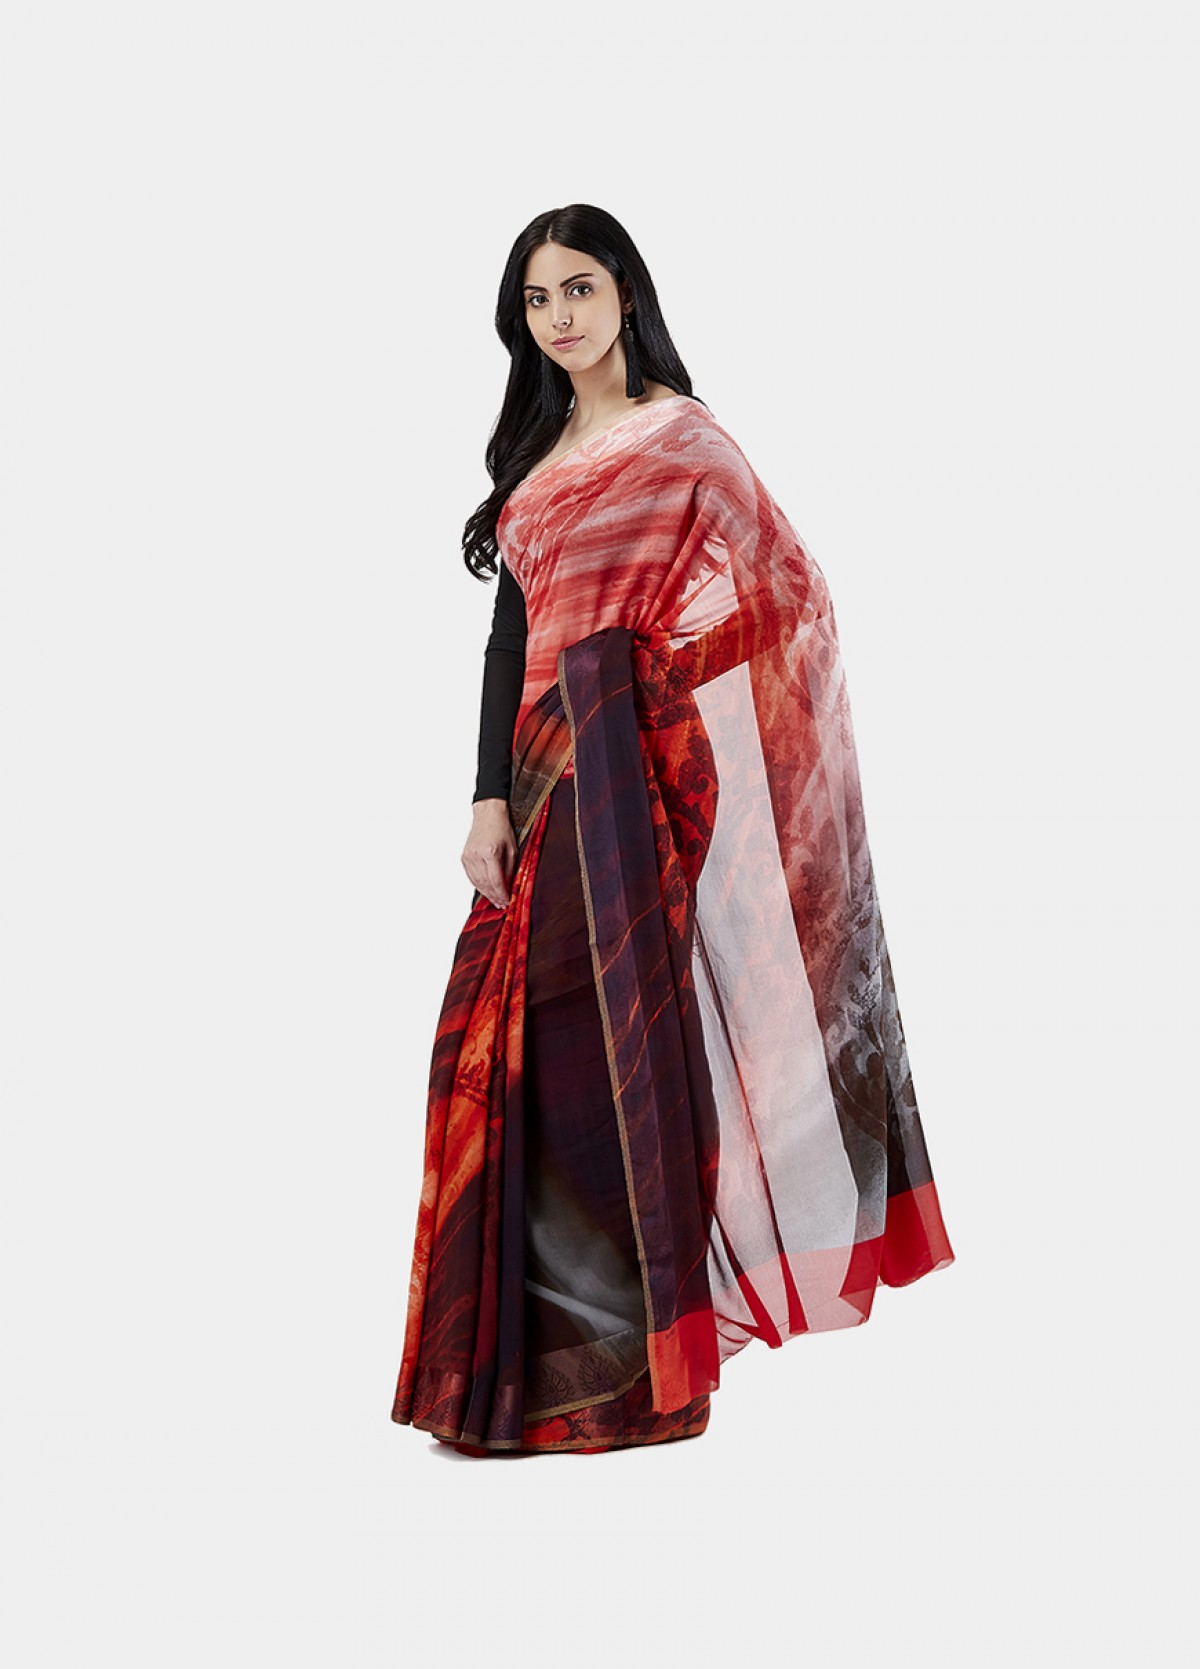 The Nothern Lights Sari